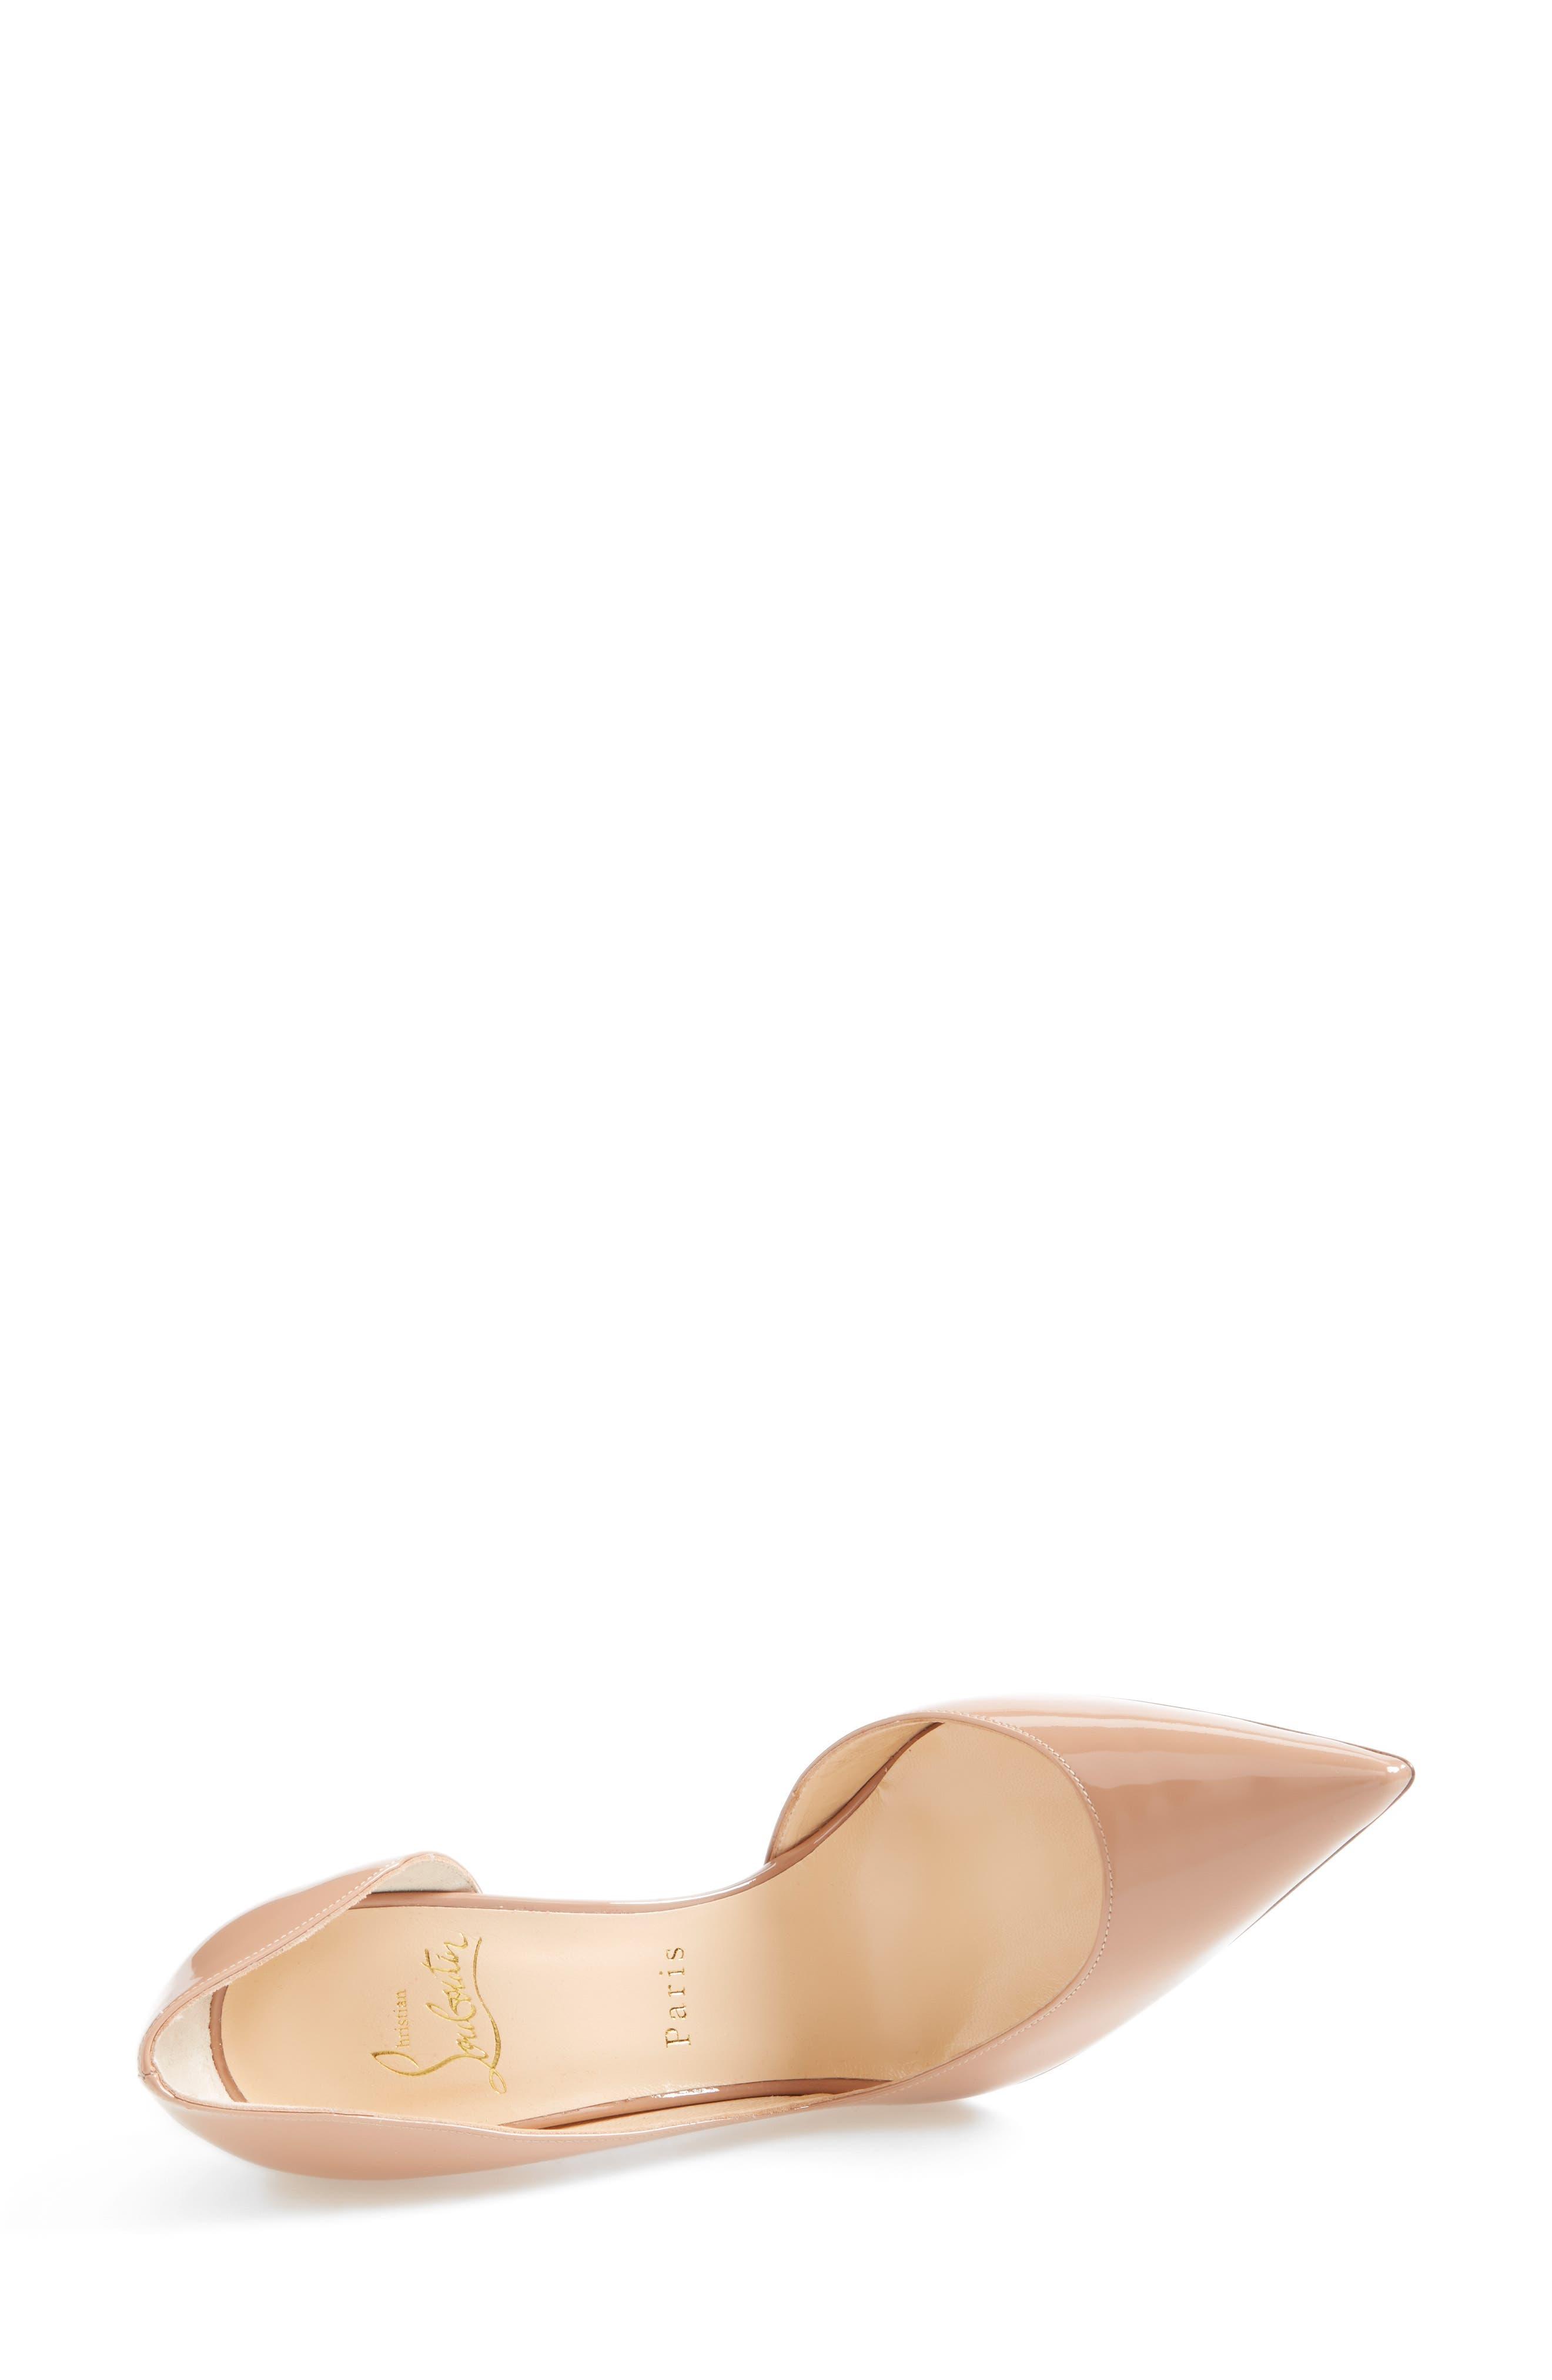 'Iriza' Pointy Toe Half d'Orsay Pump,                             Alternate thumbnail 2, color,                             NUDE